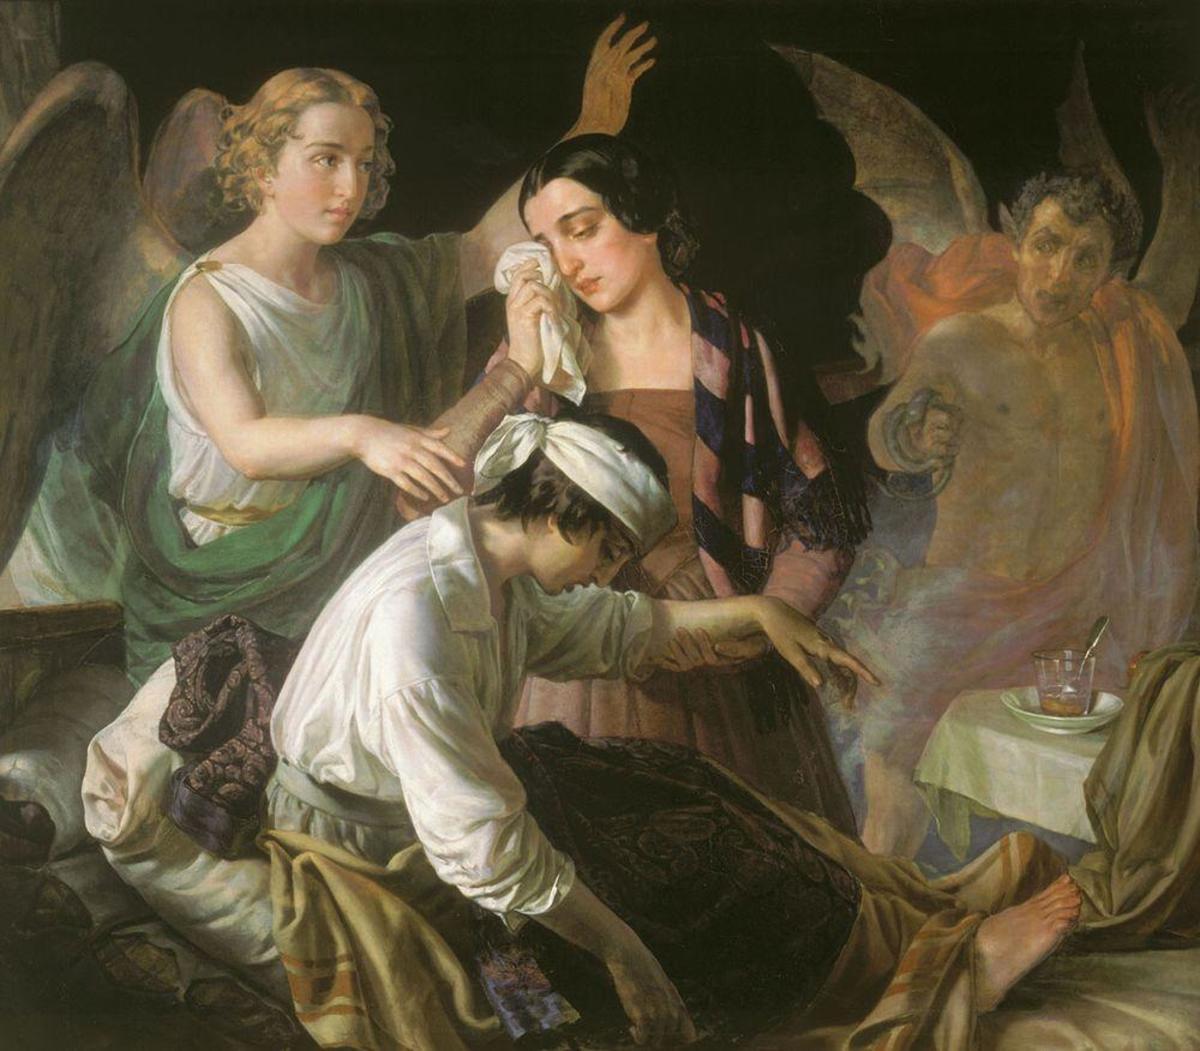 Angel Fighting for the Soul; By Alexey Tyranov (http://www.artsait.ru/art/t/tiranov/art1.php) [Public domain], via Wikimedia Commons